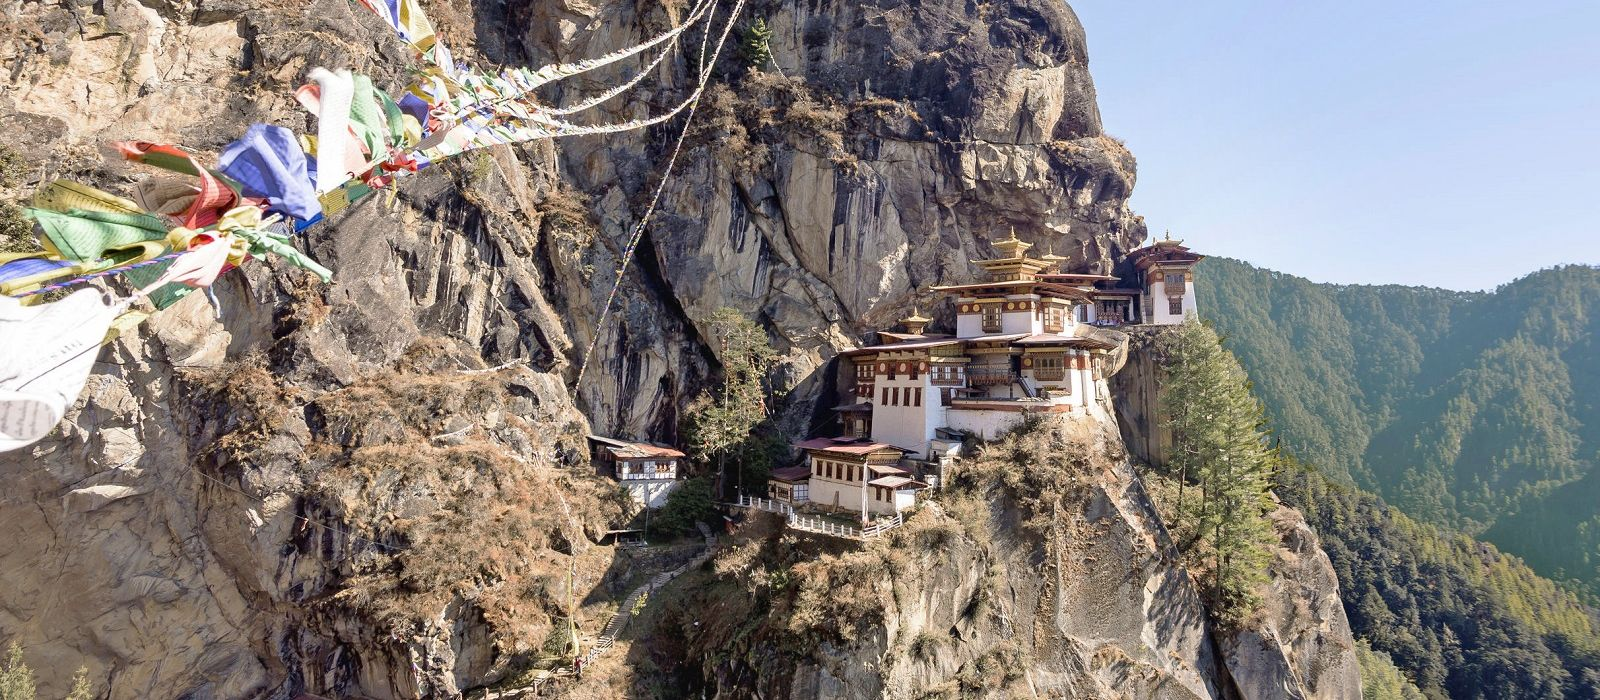 Highlights der Himalayas: Nepal, Bhutan und Tibet Urlaub 6